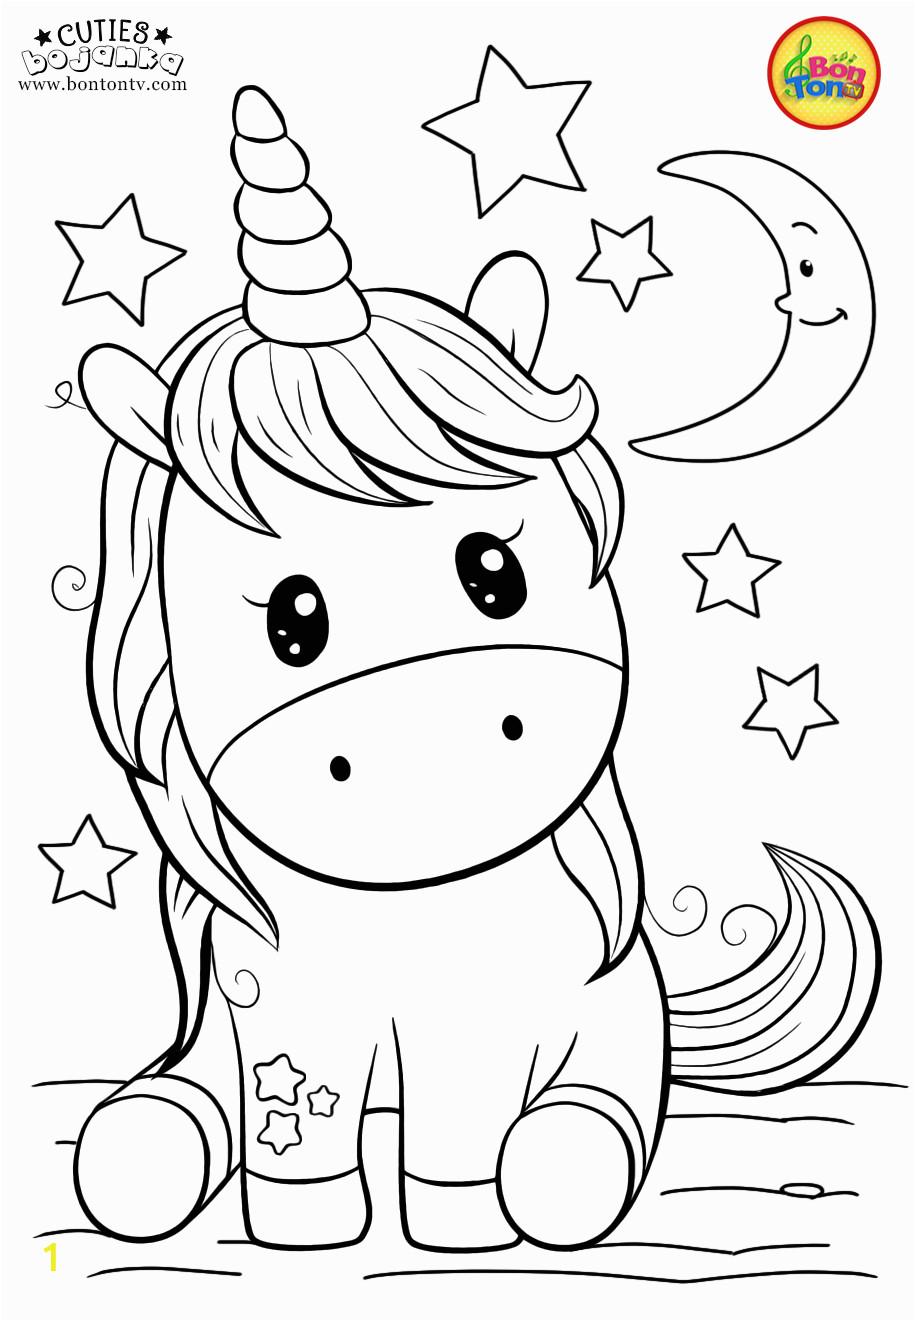 Preschool Coloring Pages Printable Unicorn Cuties Coloring Pages for Kids Free Preschool Printables